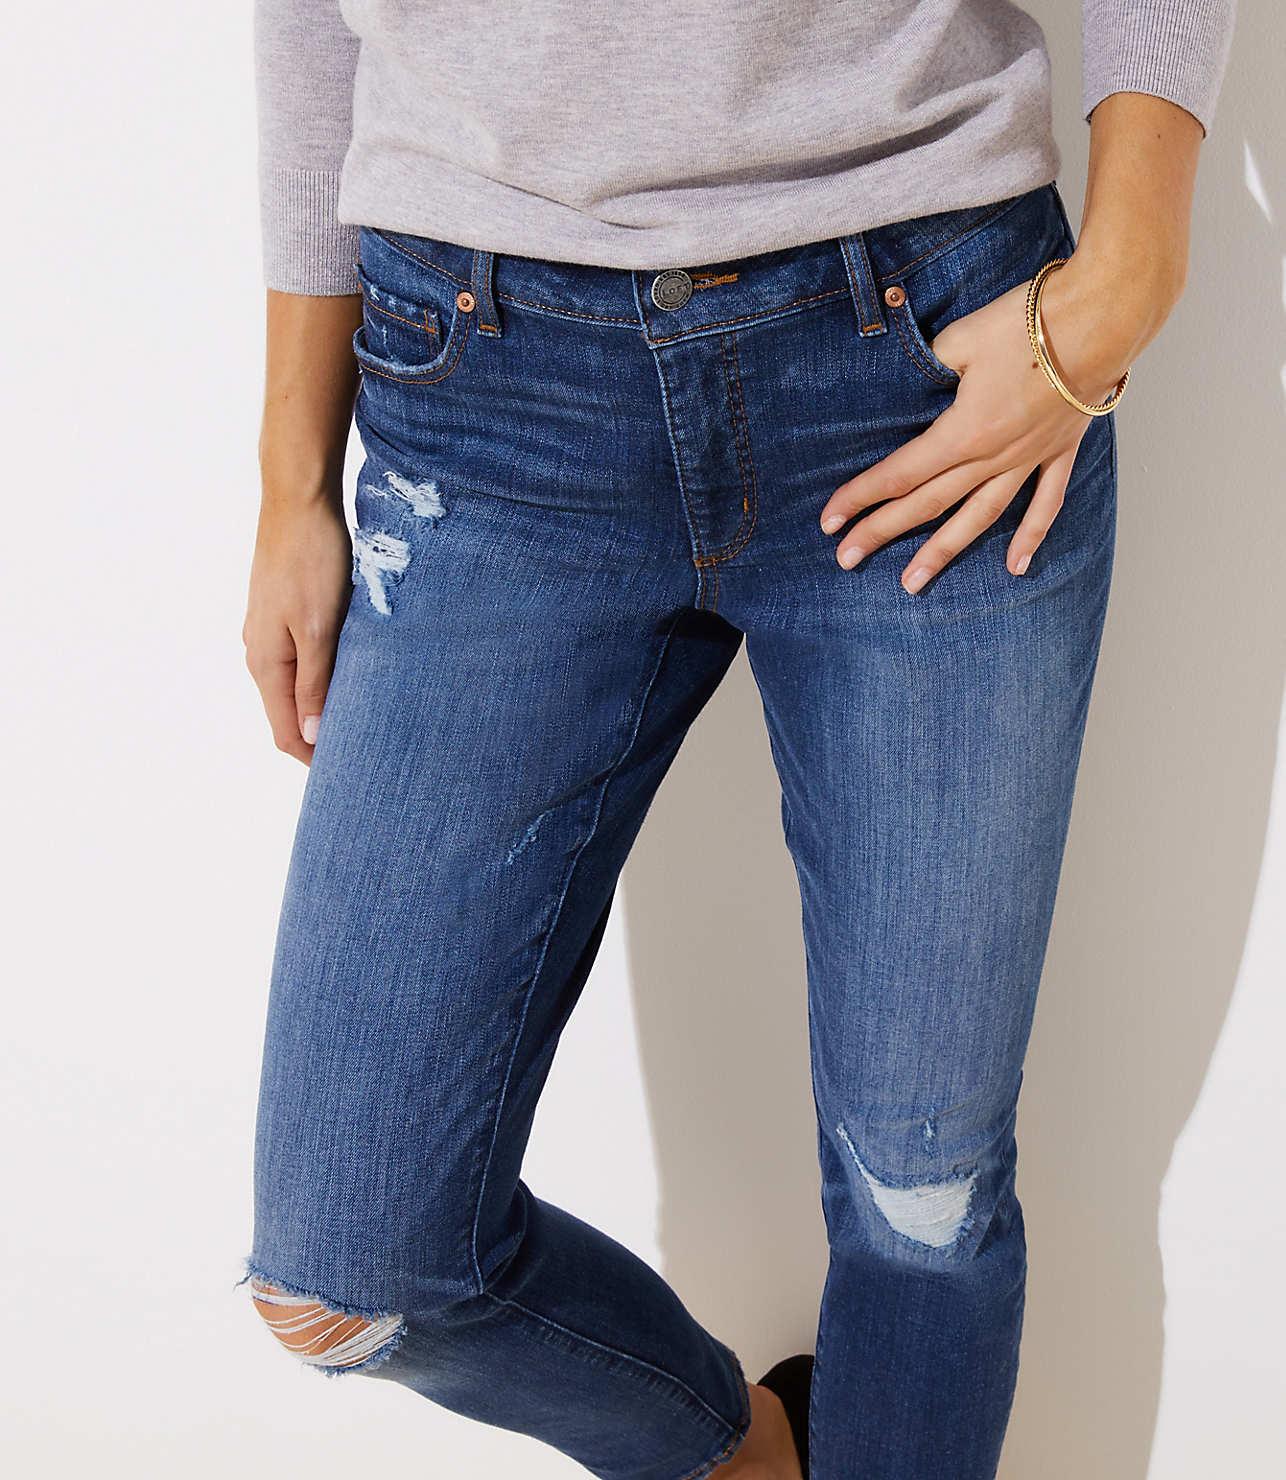 official photos 8f620 1b51d Destructed Slim Pocket Skinny Jeans in Mid Indigo Wash | LOFT